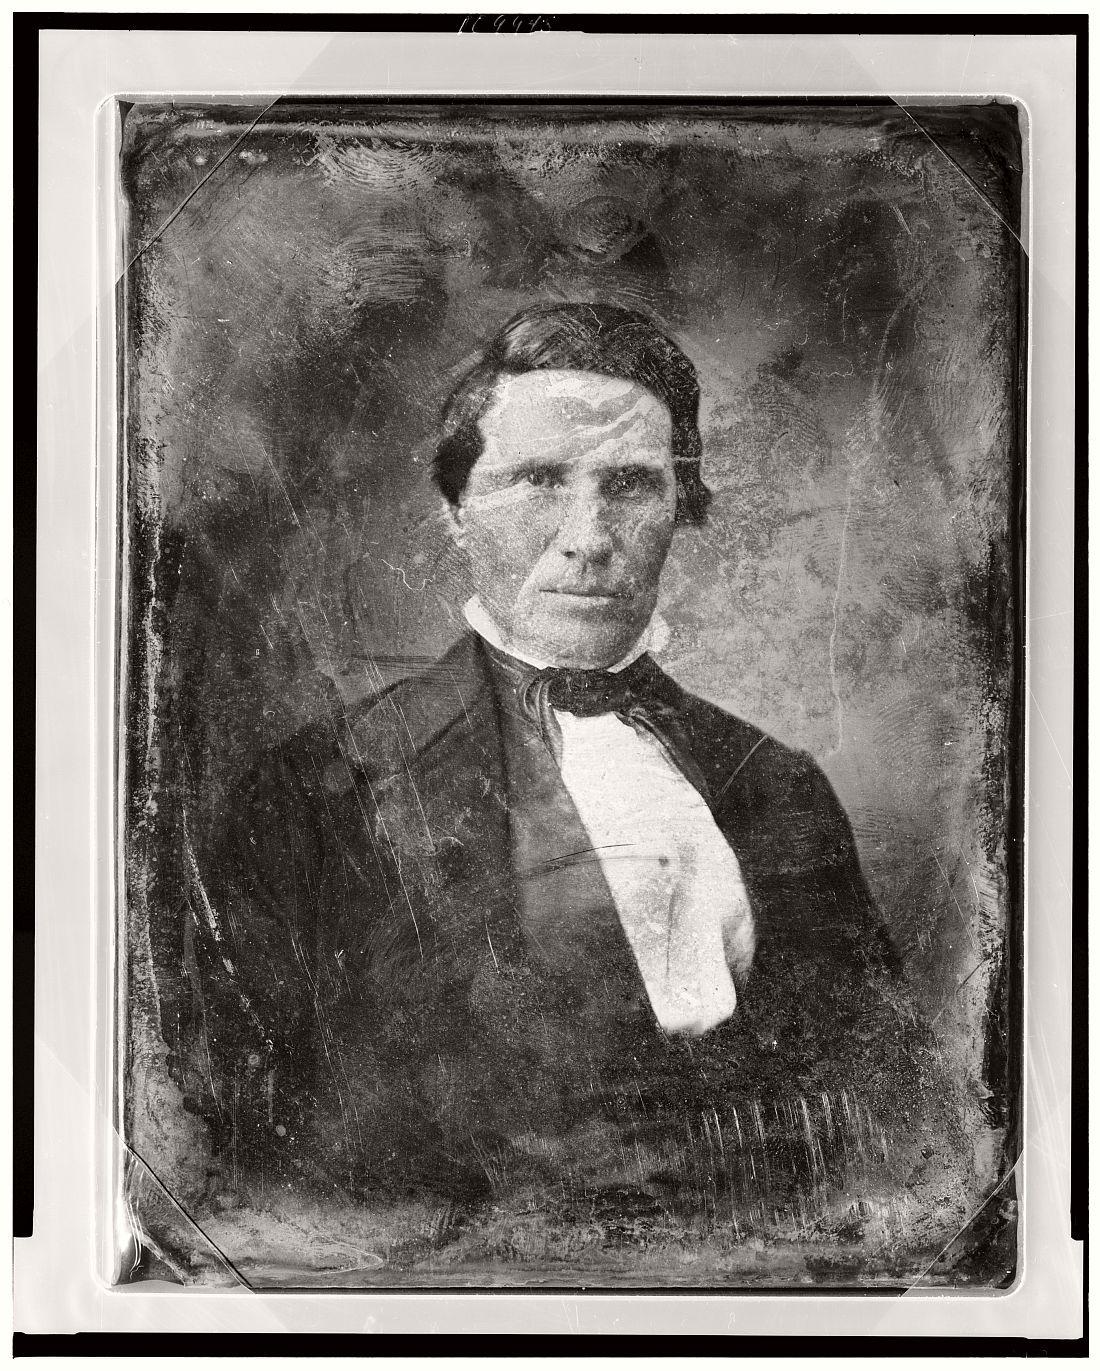 vintage-daguerreotype-portraits-from-xix-century-1844-1860-30